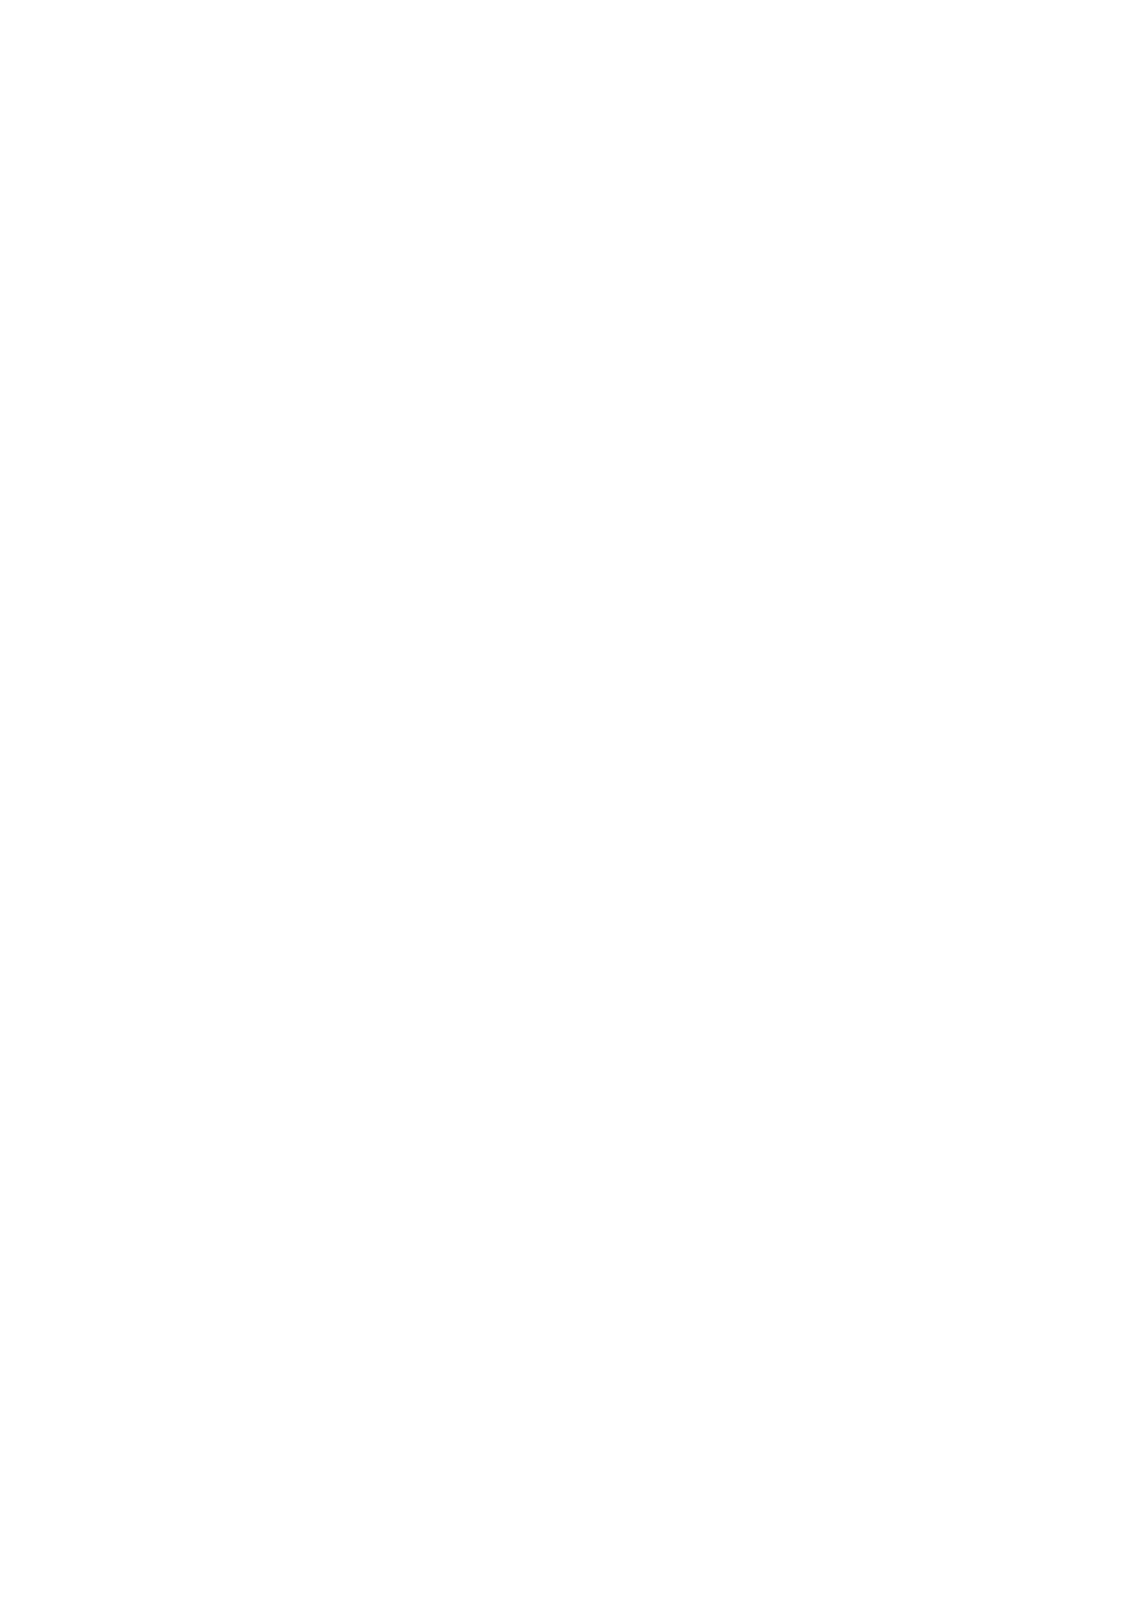 [Dai Sasaduka] ikoku no hanayome ~ seiai ressun wa kimigatame ~ | 異國的花嫁~為你接受的sex教學~ [Chinese] [莉赛特汉化组] 1